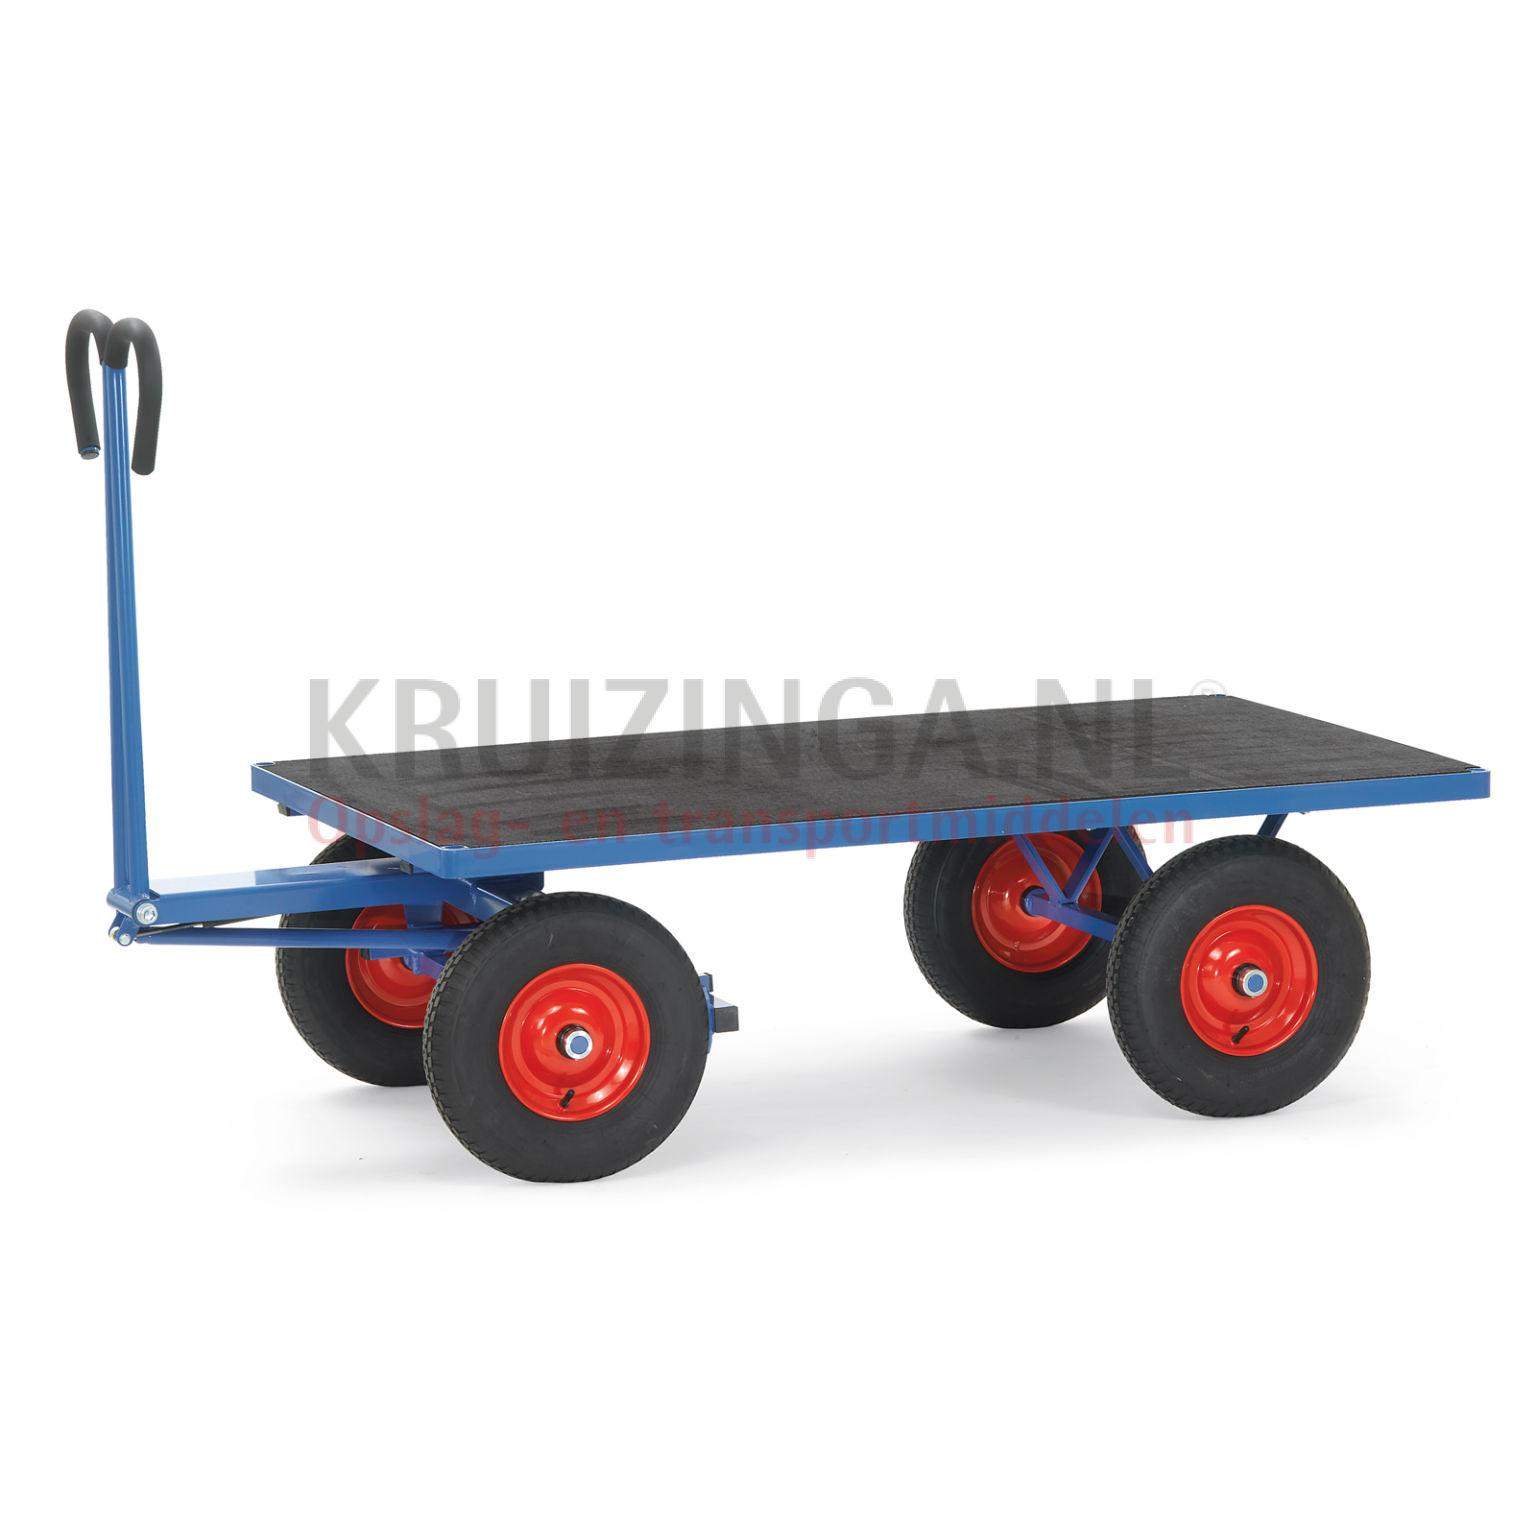 chariot bras l ger chariot de manutention chariot bras plate forme 801 frais de. Black Bedroom Furniture Sets. Home Design Ideas